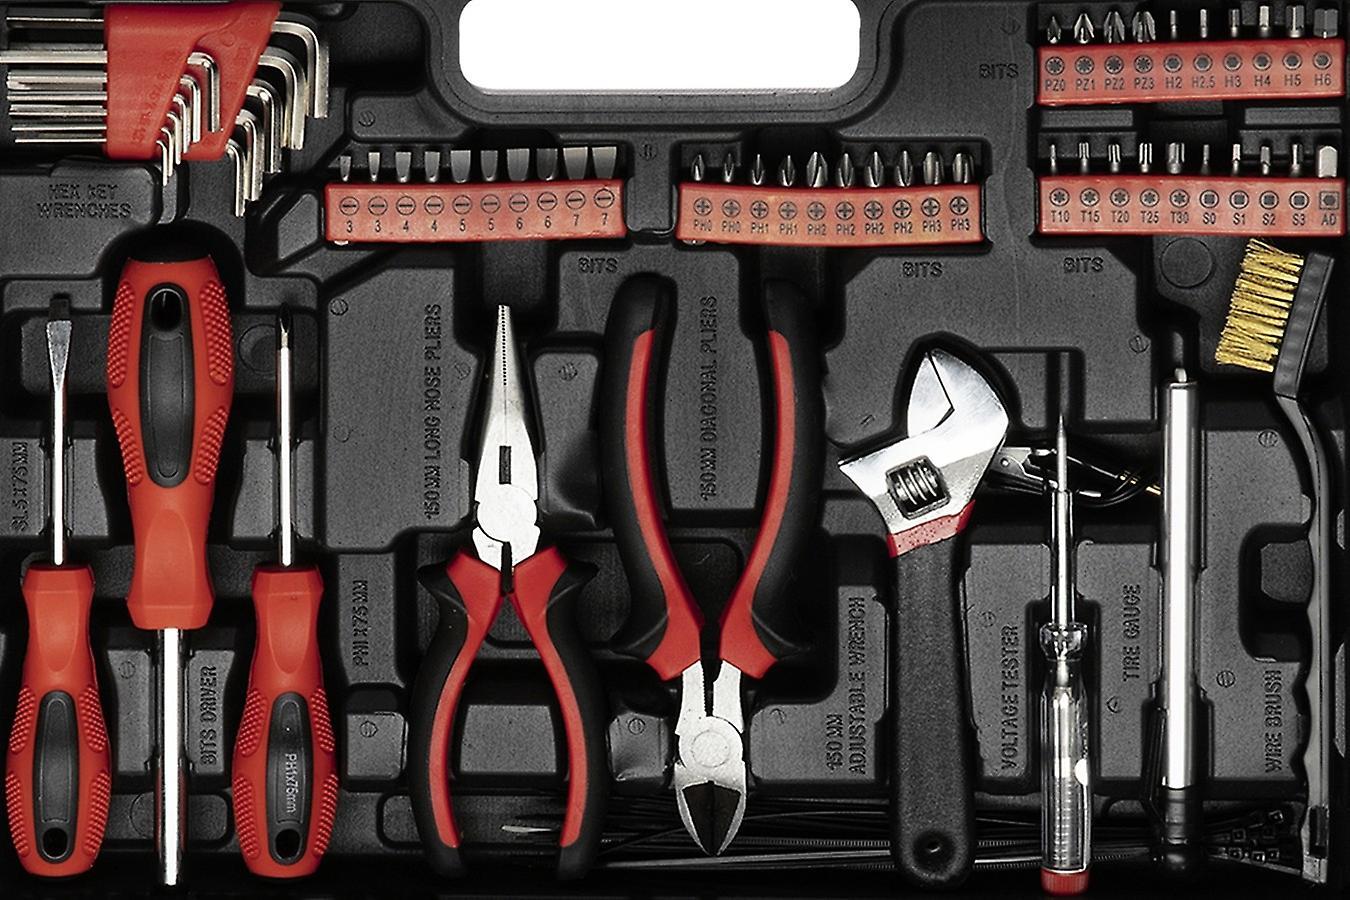 WOLFGANG 122 Parts Tool Case with Tool Set, Wrench Set, Ratchet, Socket Set, Screwdriver, Bitset, Toolbox for Household, Car, Workshop